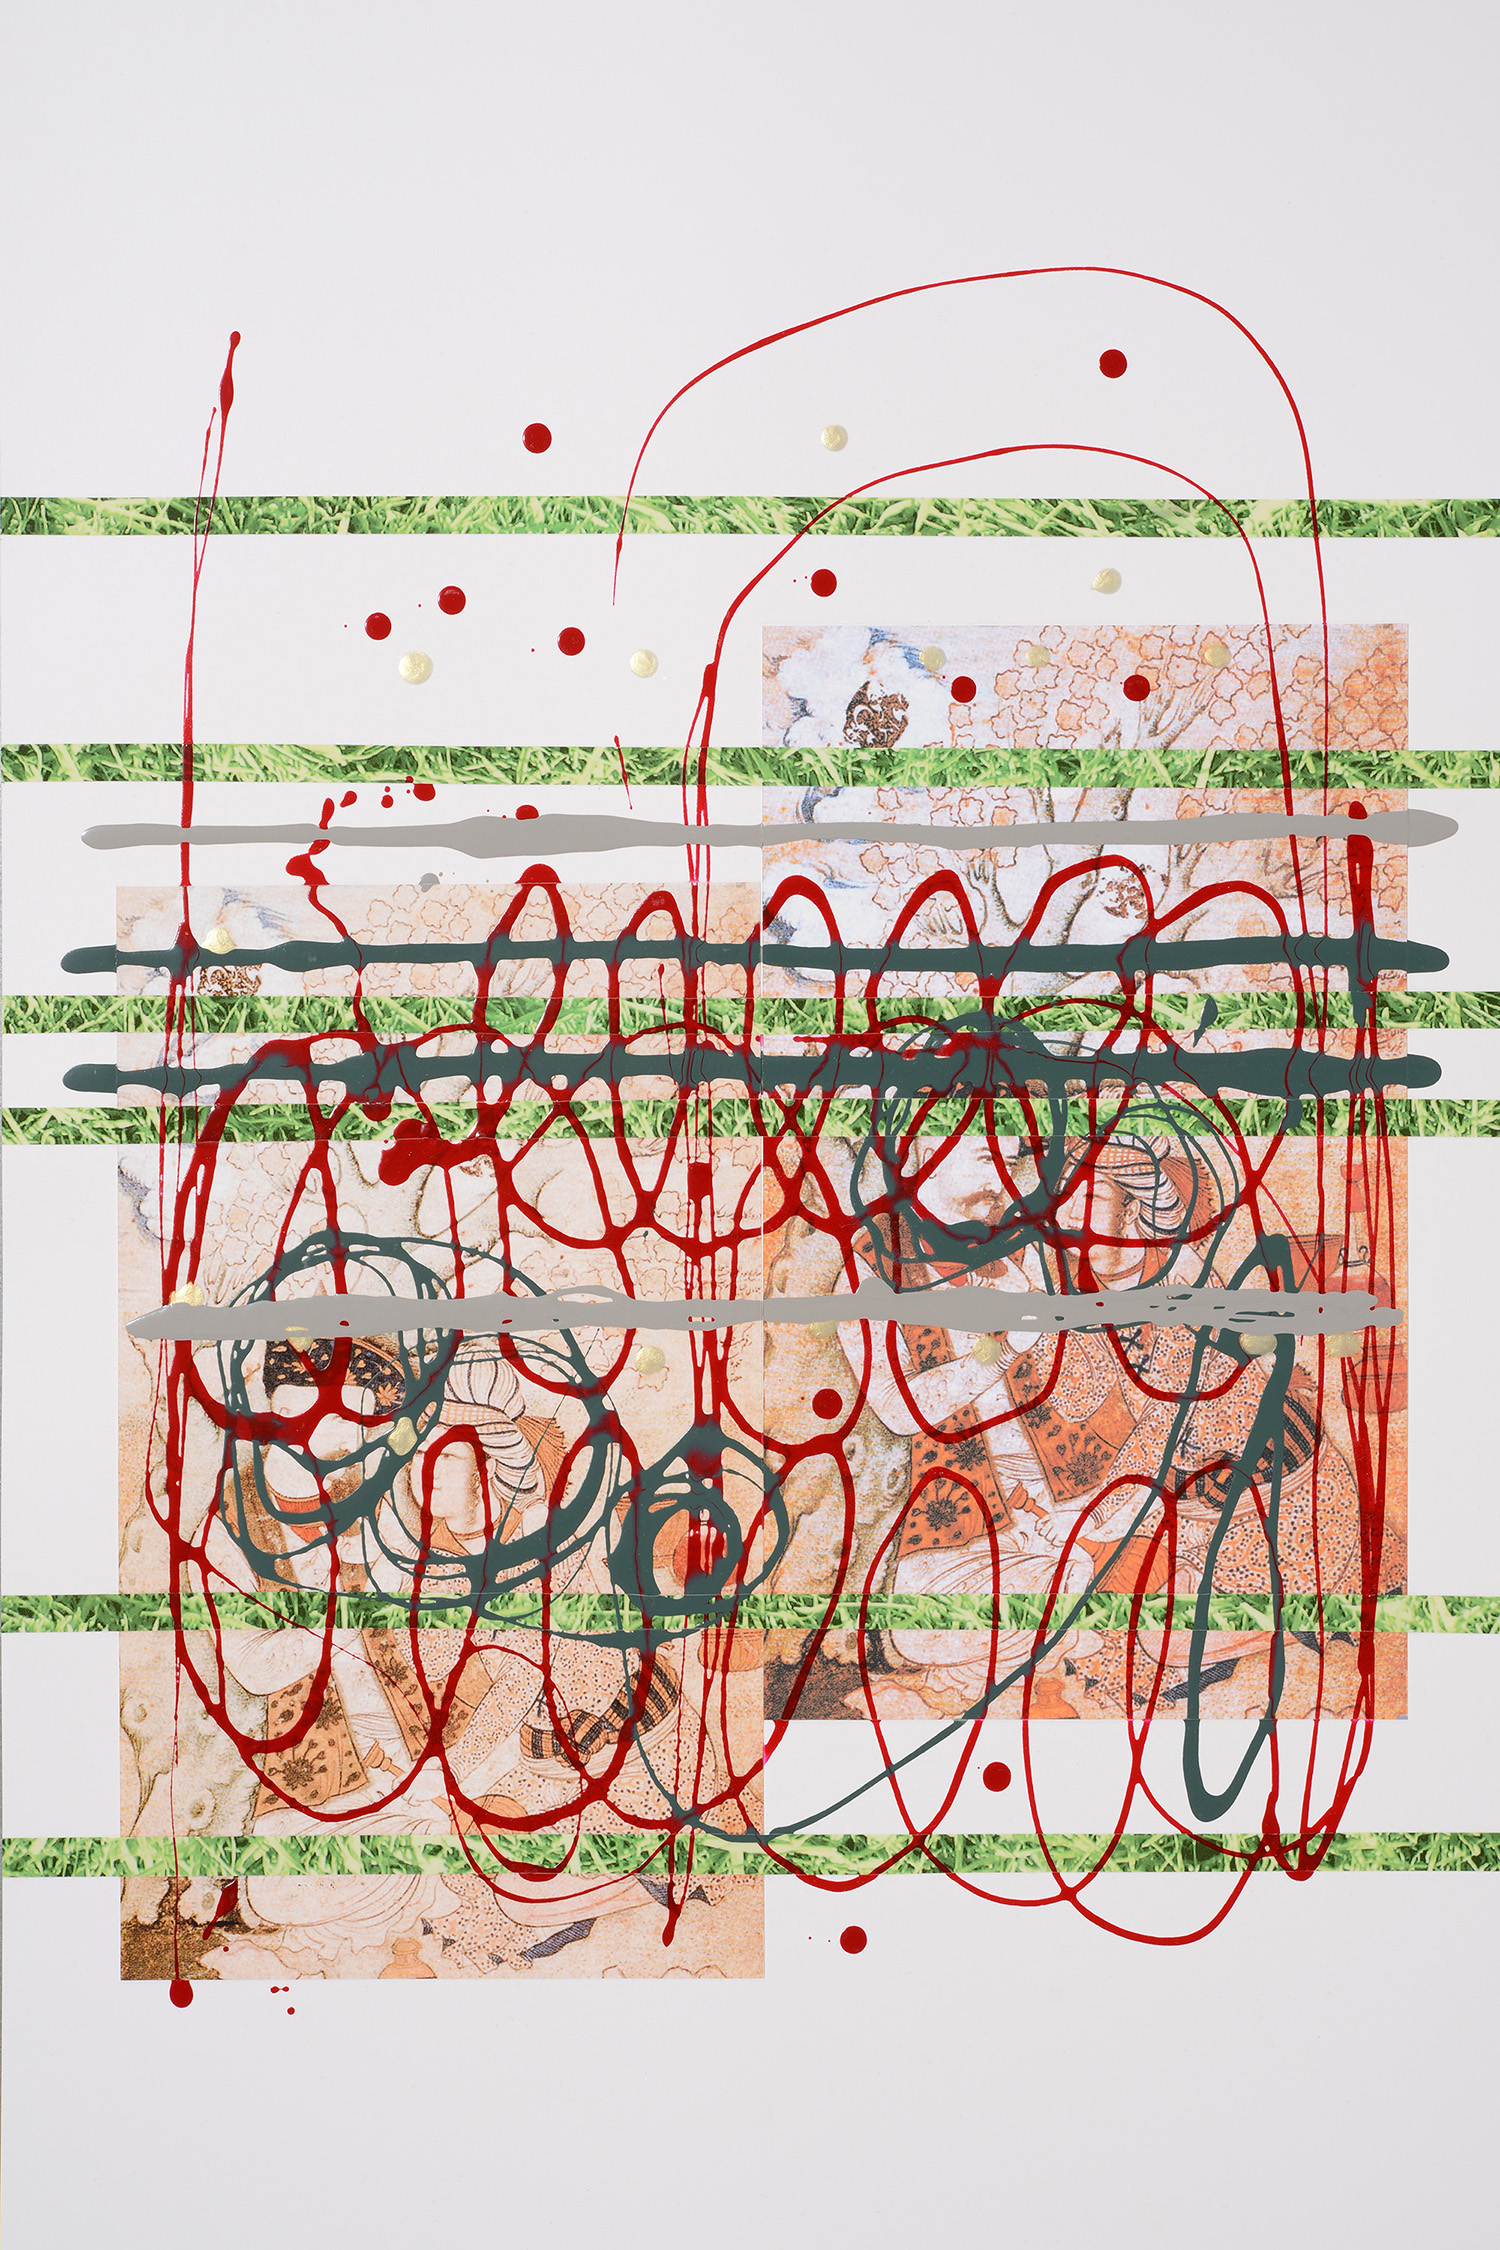 Markues, Secret Rendezvous, 2013, mixed media on paper, 60 x 40 cm.jpg